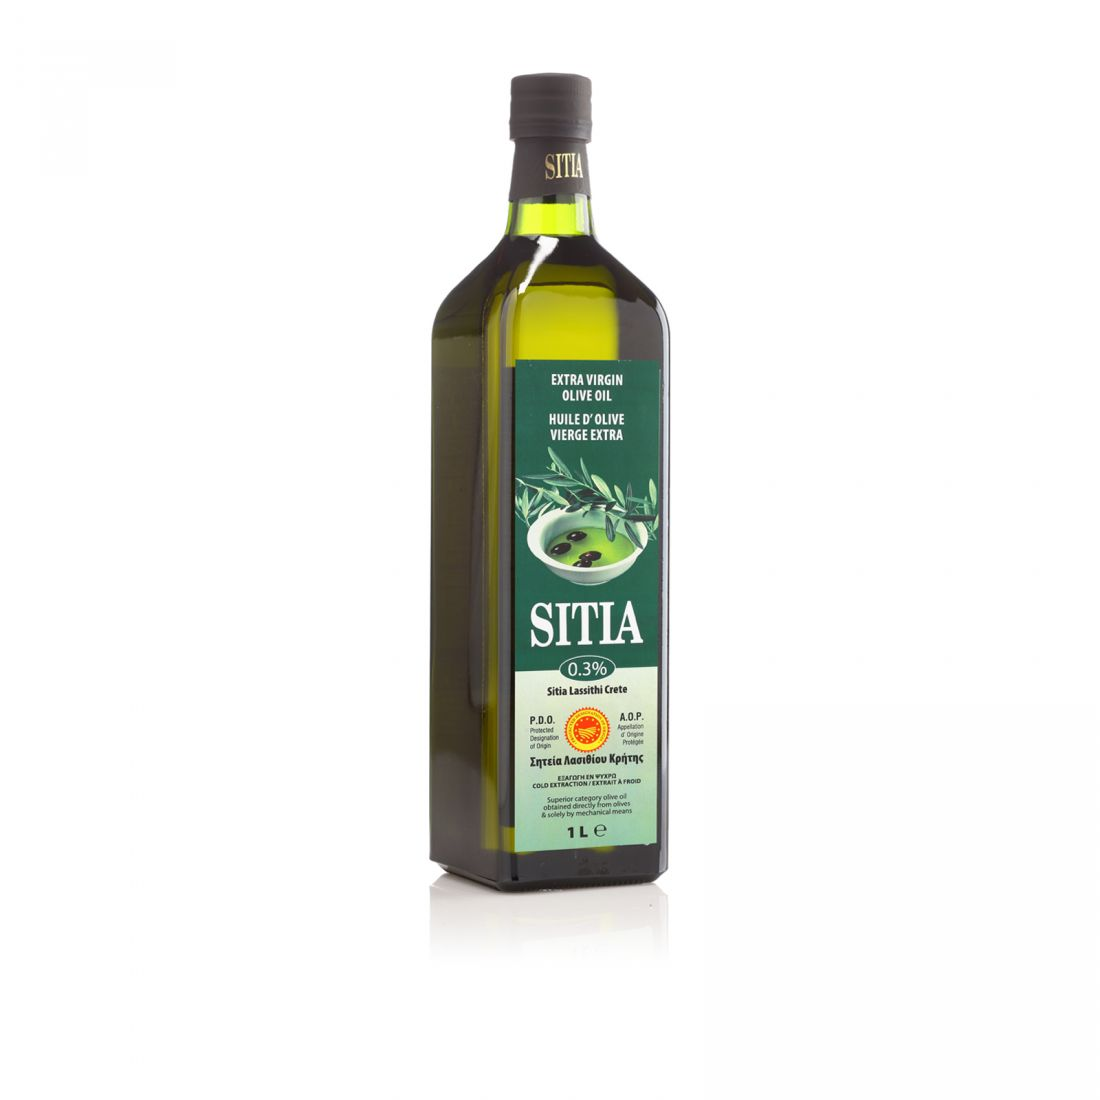 Оливковое масло SITIA - 1 л 0.3 экстра вирджин PDO стекло